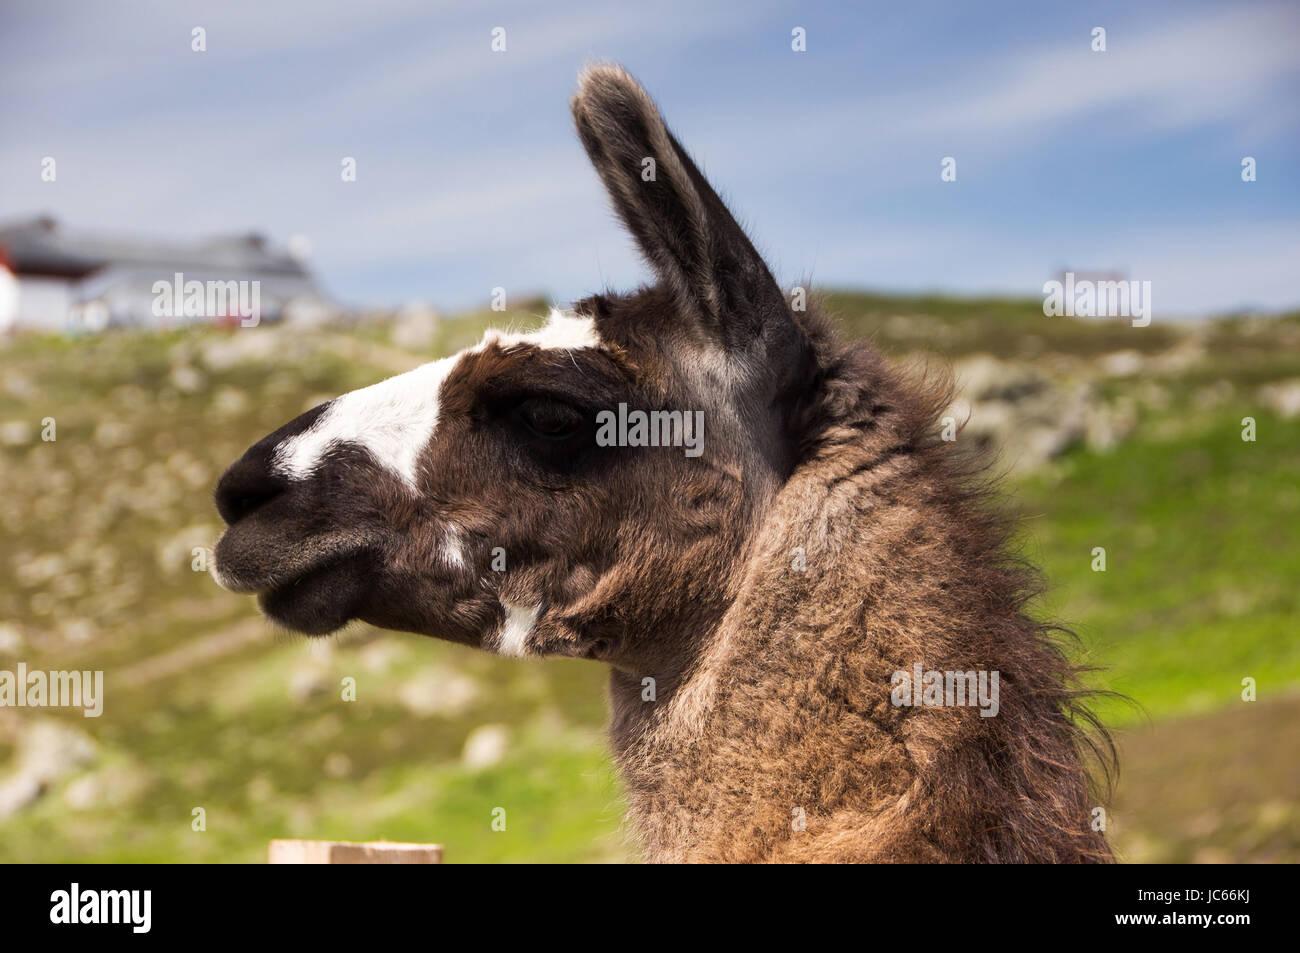 Llama, a type home in South America of the camels , Lama, eine in Südamerika heimische Gattung der Kamele - Stock Image